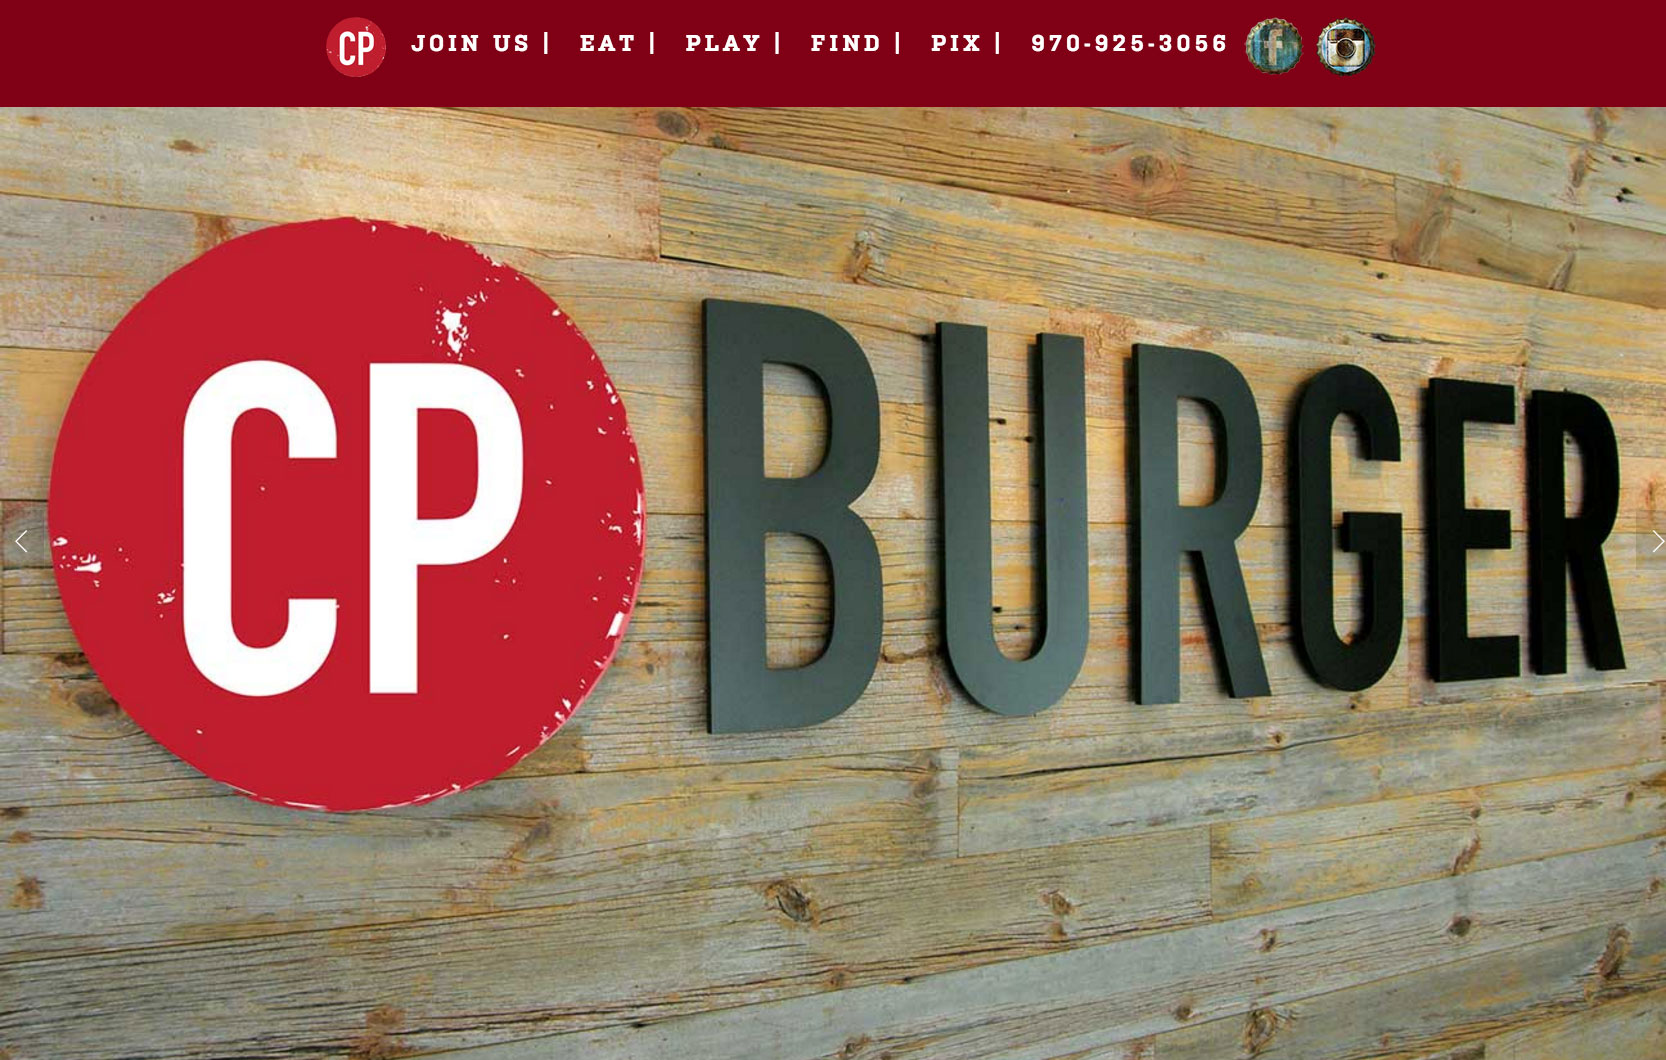 cpburger.jpg